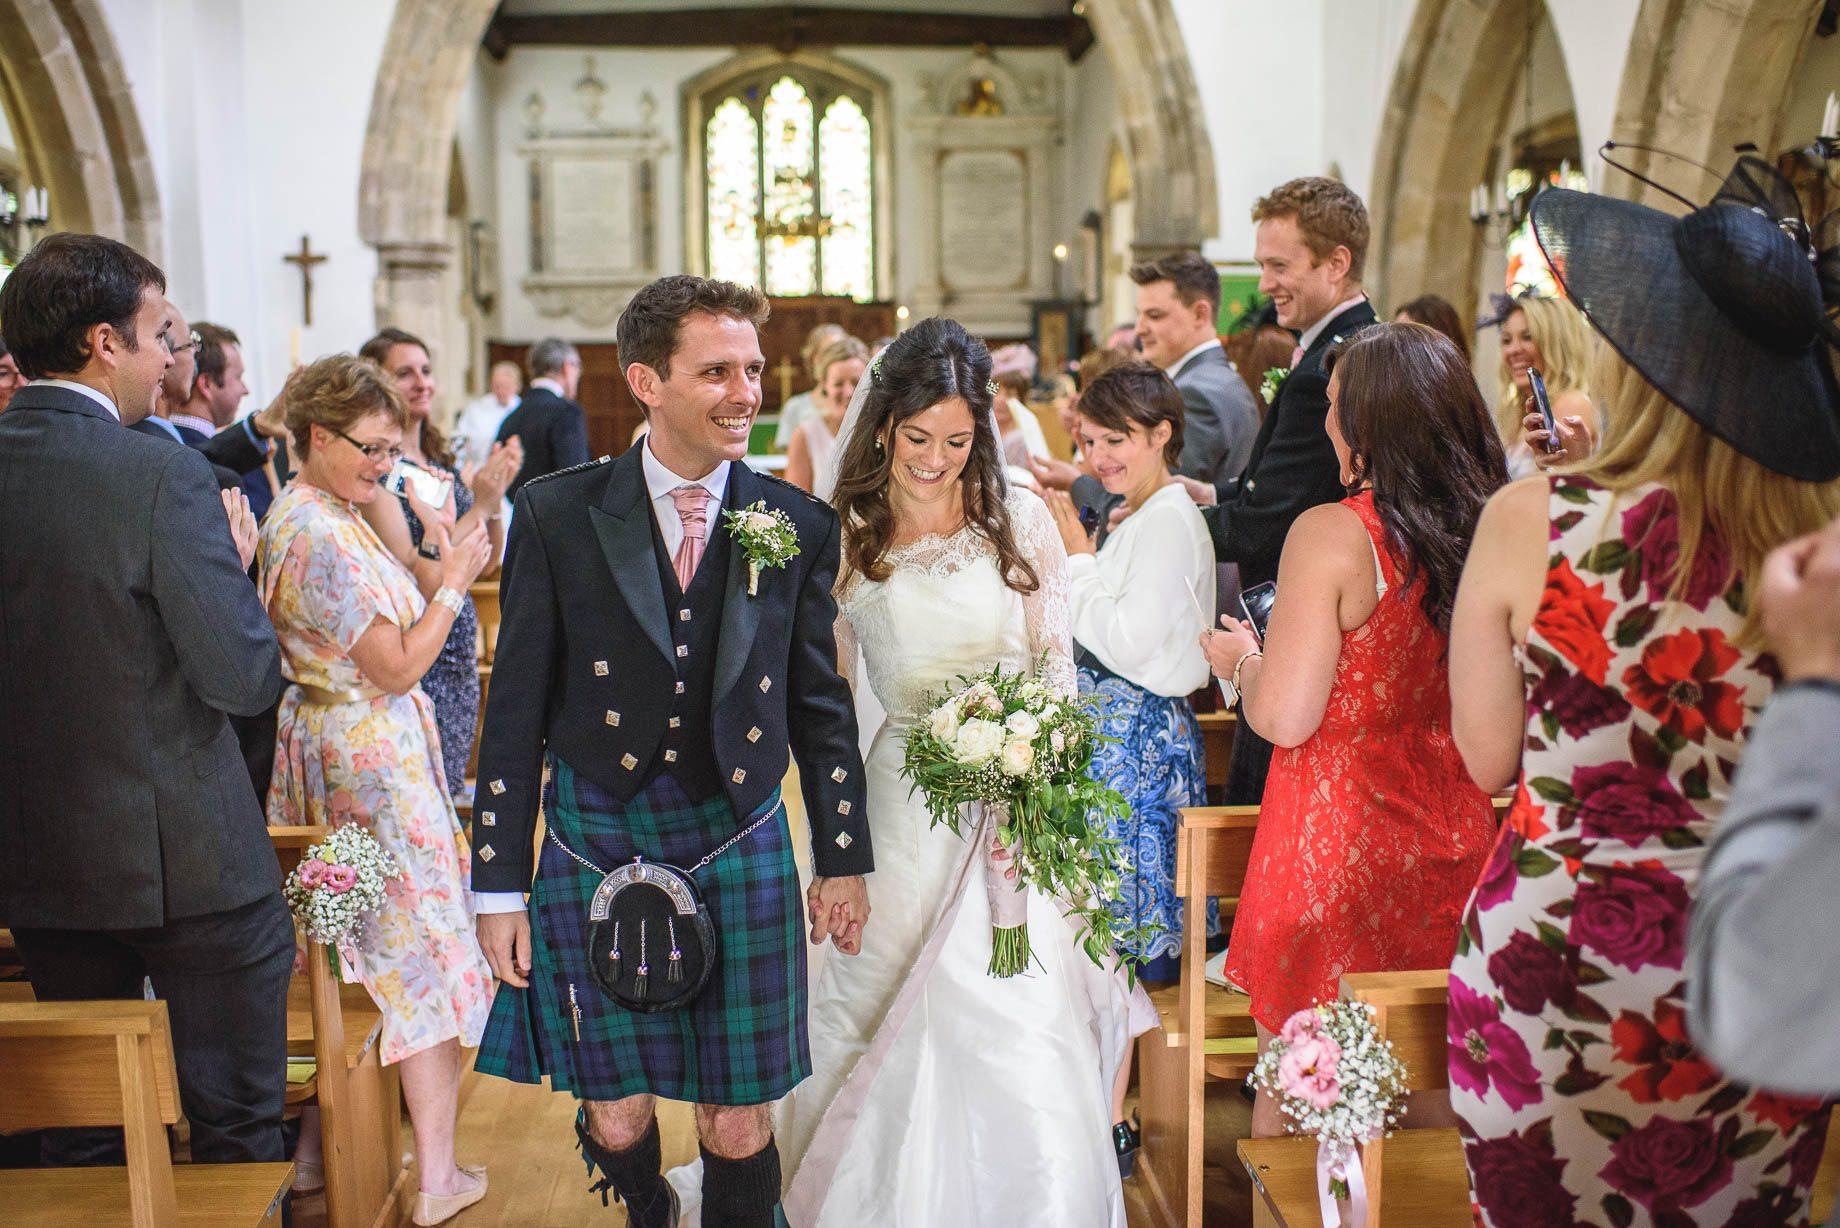 Gildings Barn wedding photography - Sarah and Steve (58 of 190)